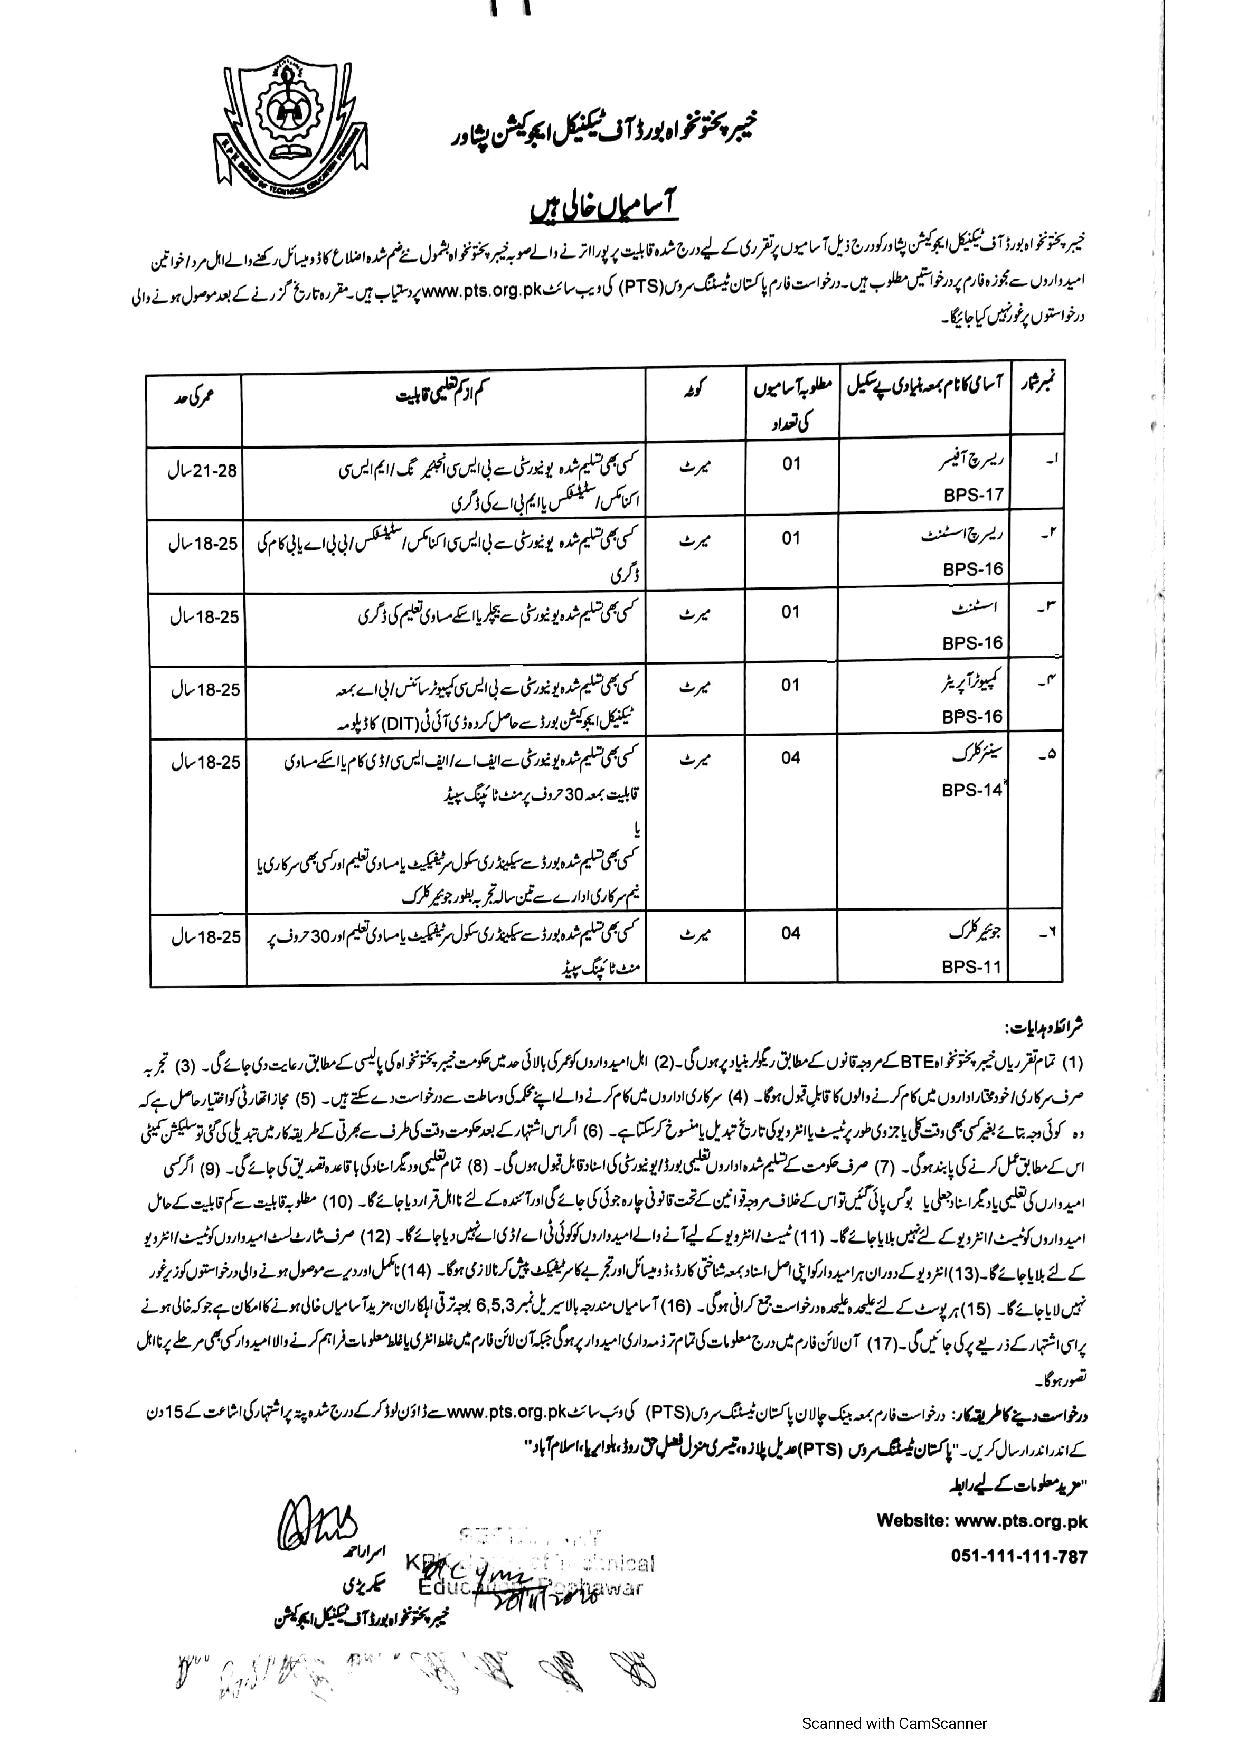 KPK Board of Technical Education (BTE-KPK) (426)| Peshawar